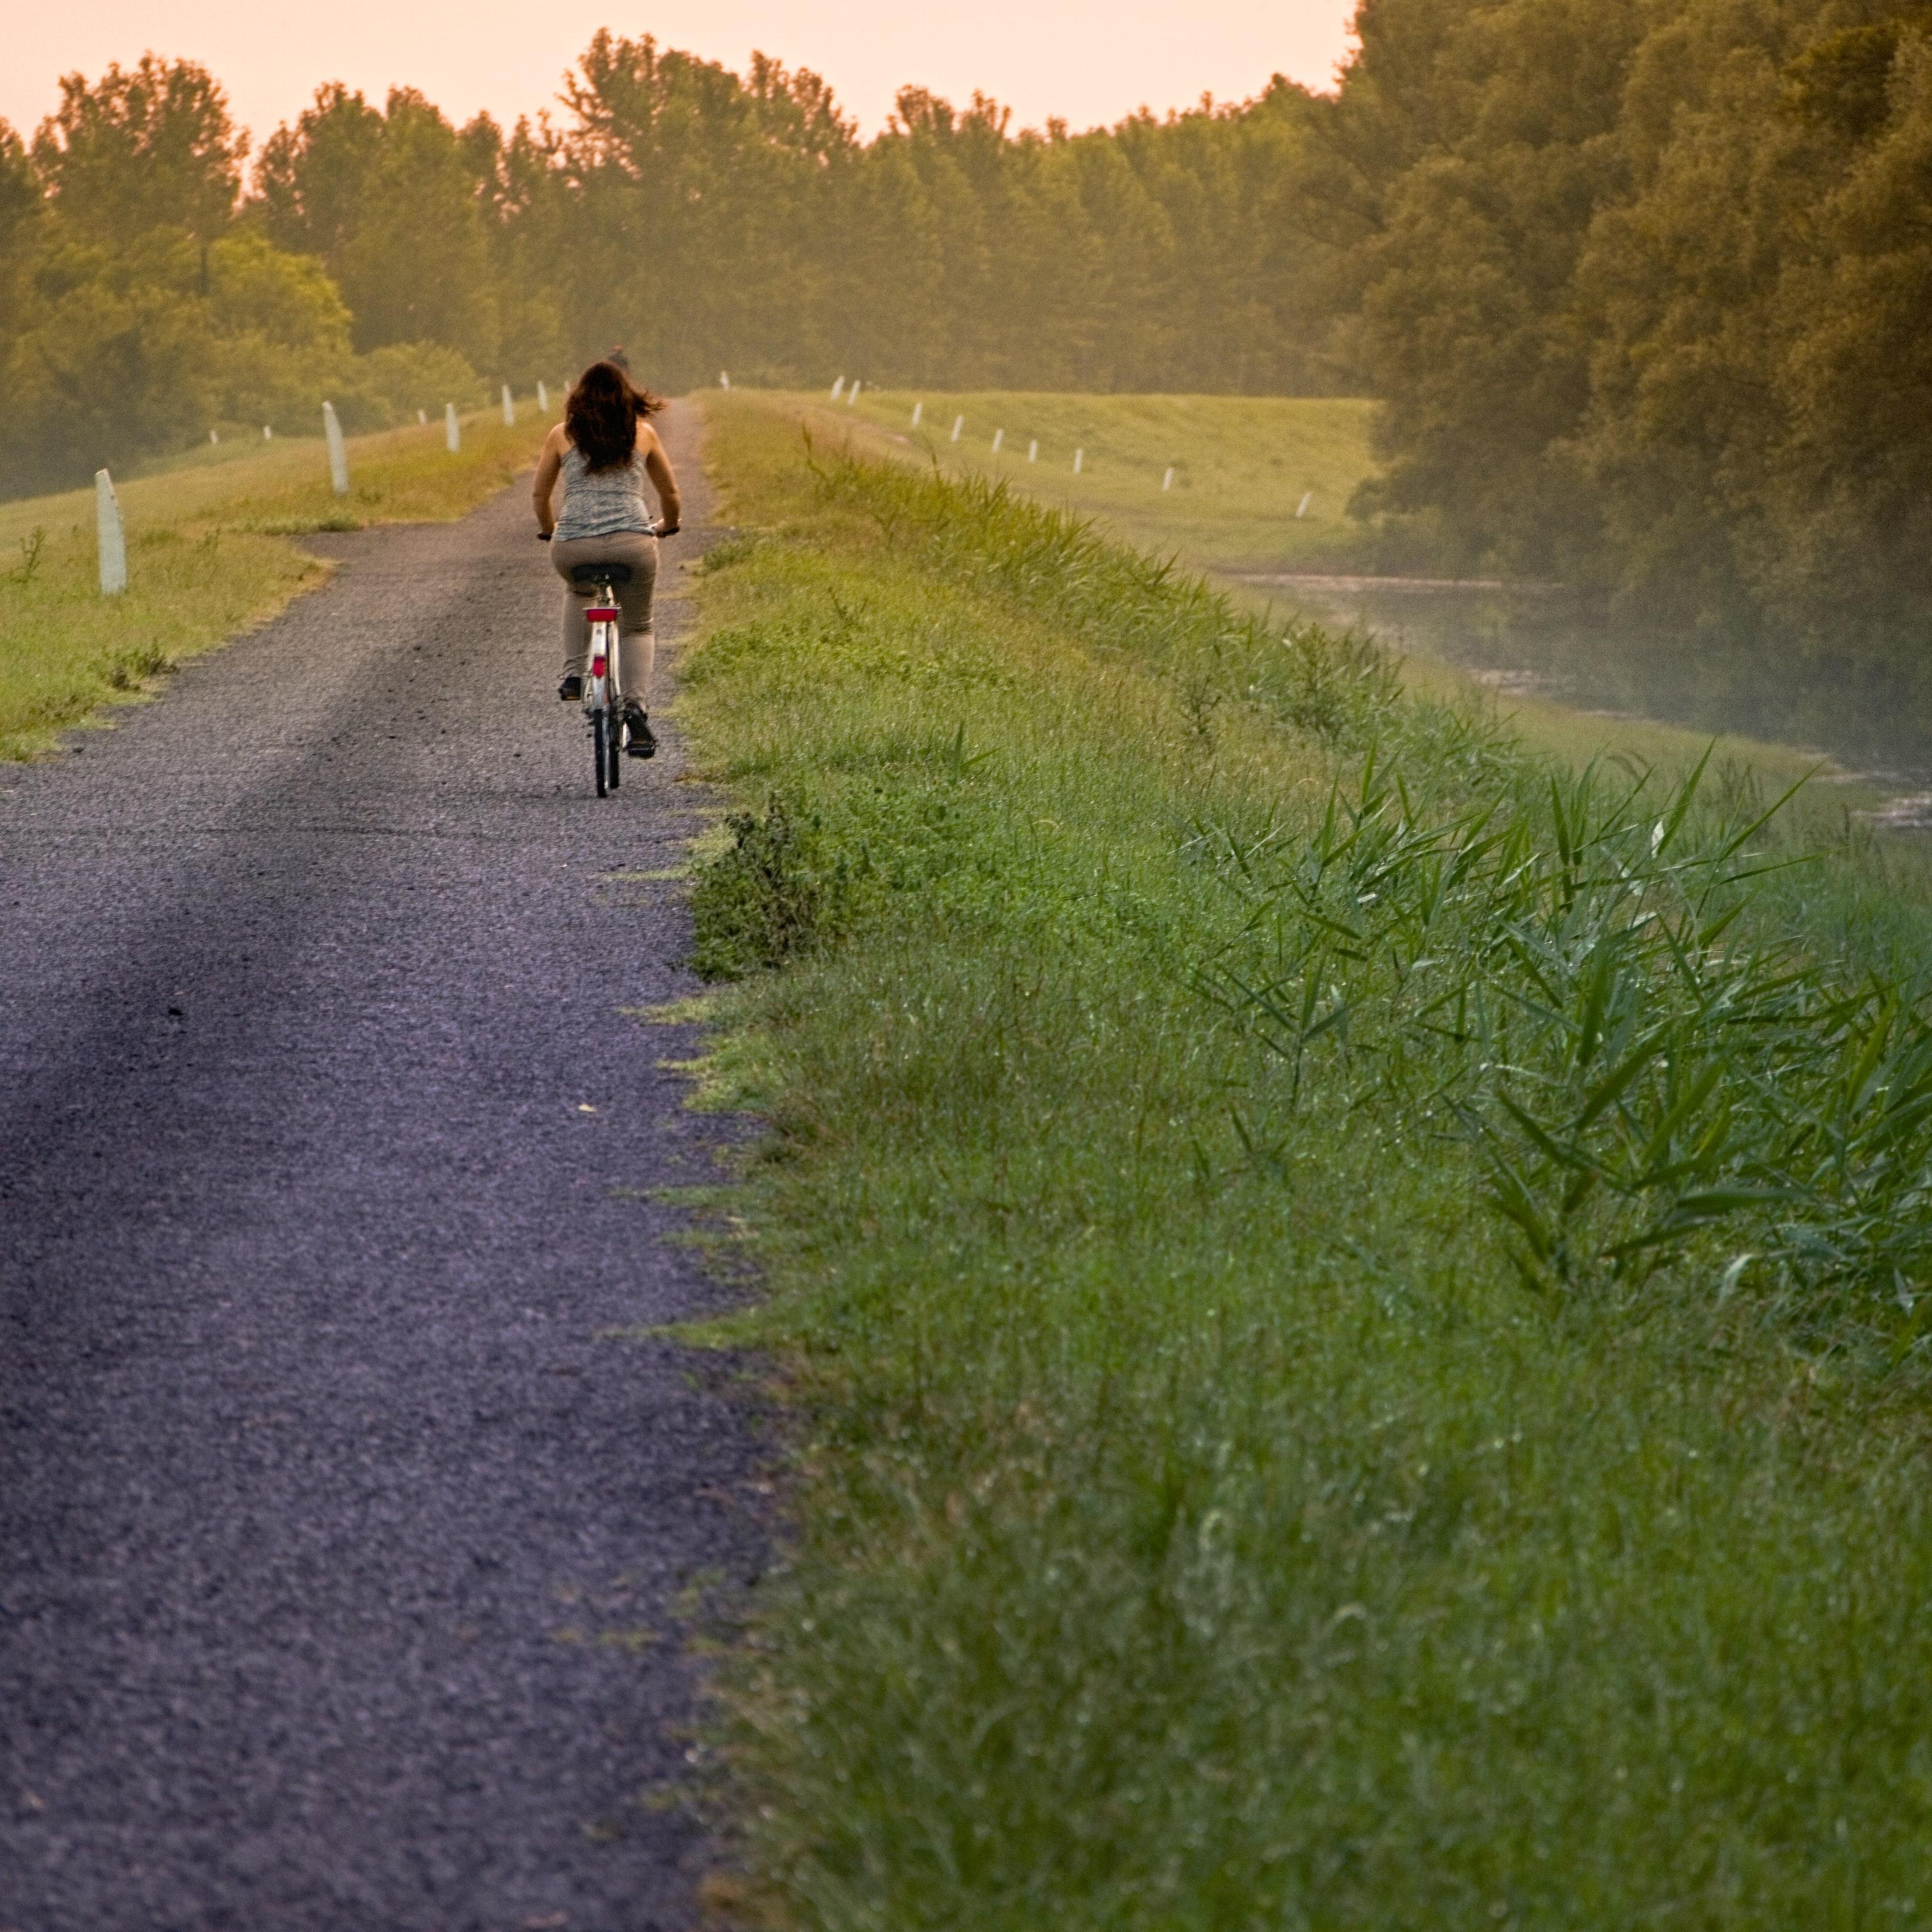 Rapariga andando de bicicleta no campo